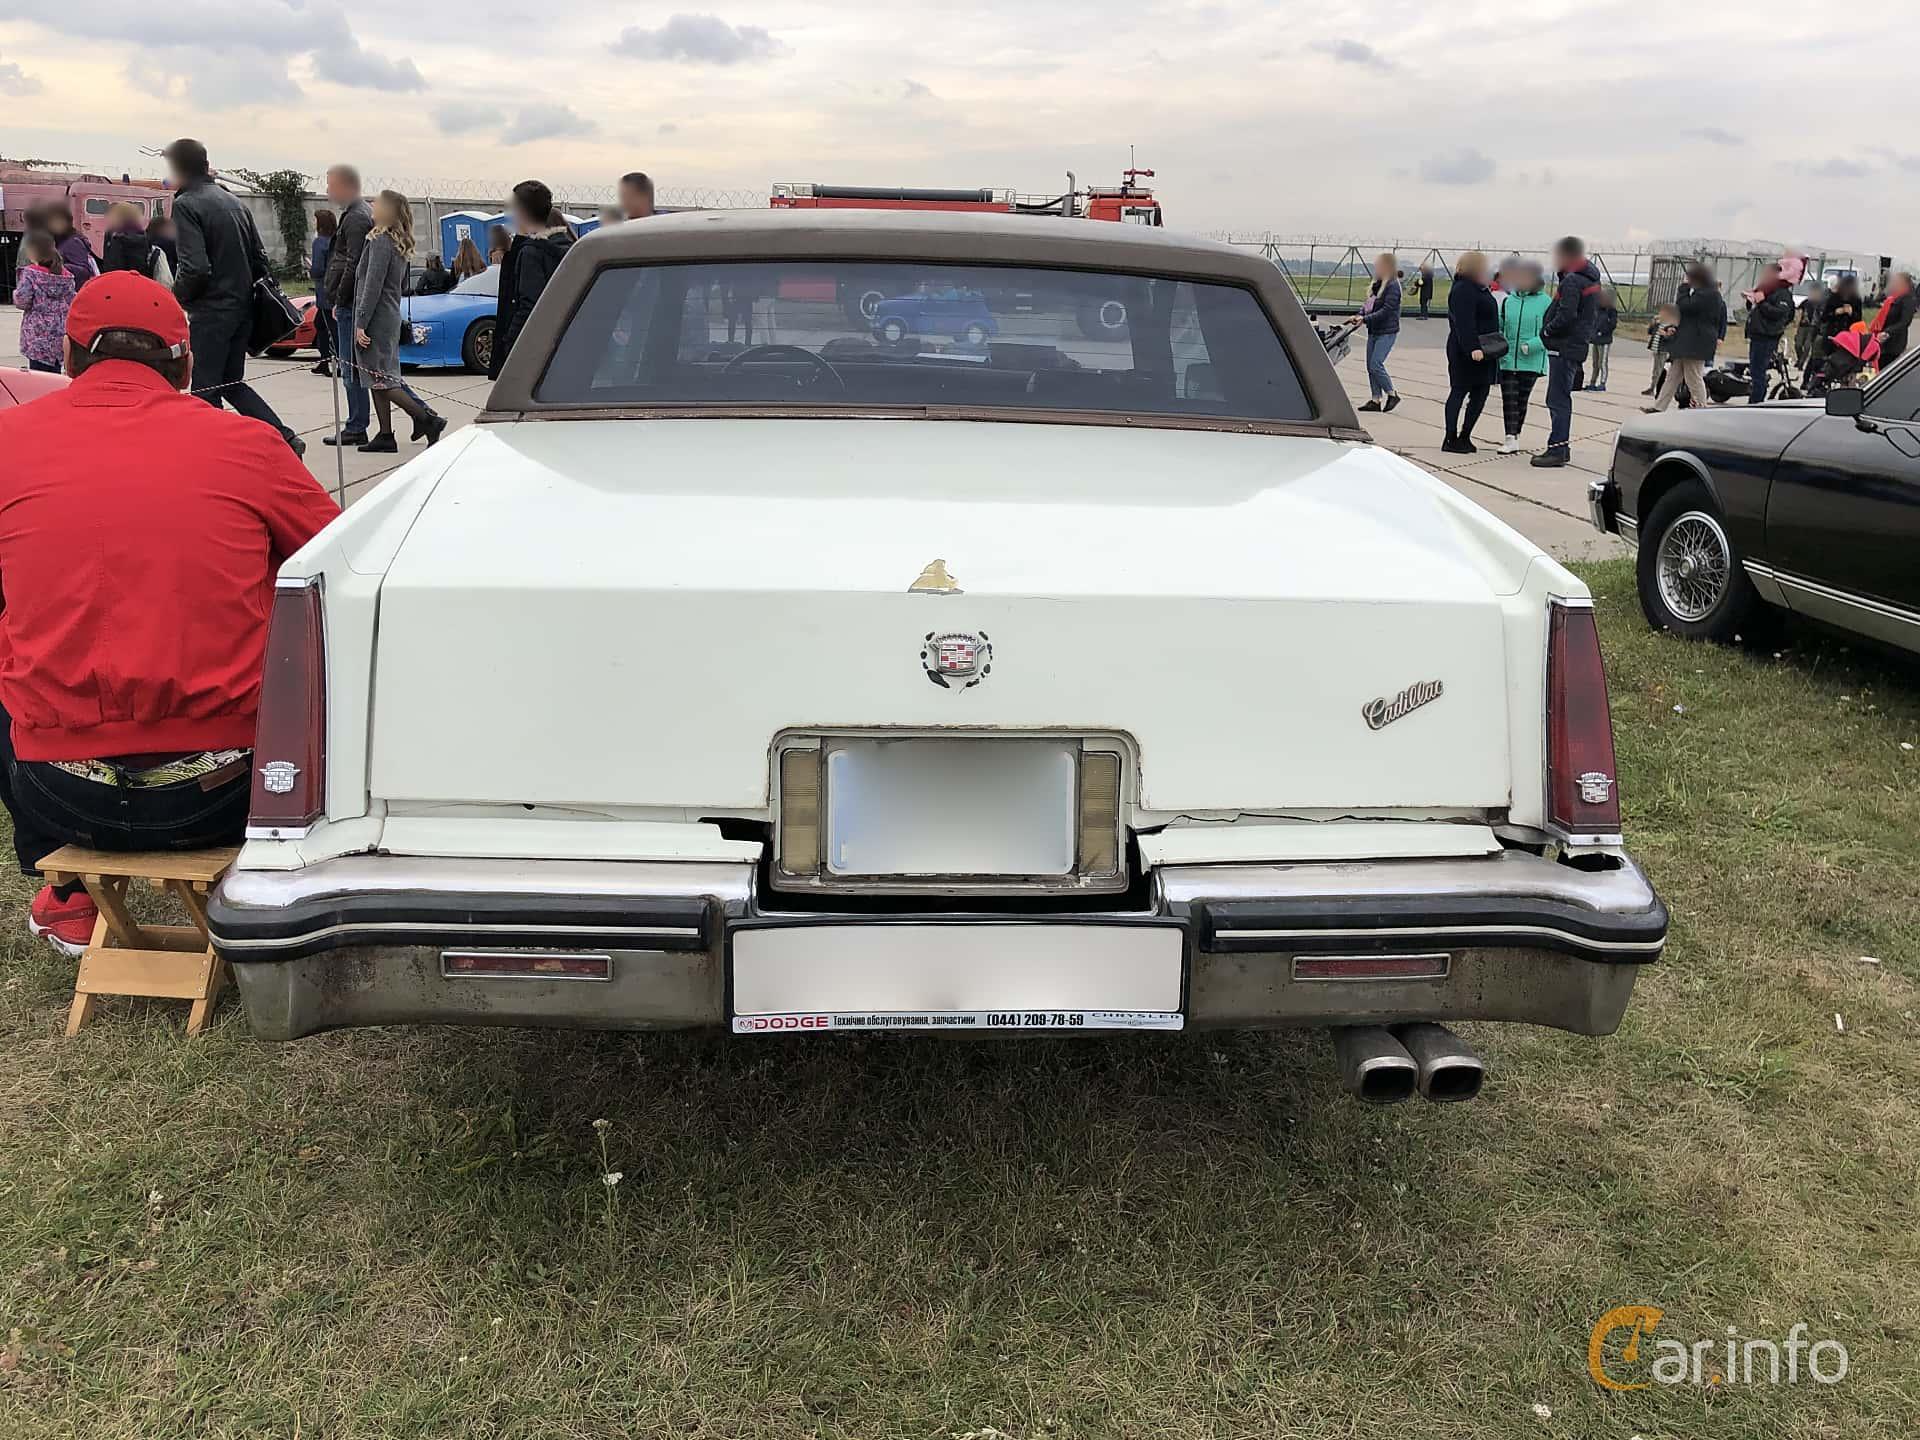 Cadillac Eldorado Coupé 5.7 V8 Automatic, 106hp, 1983 at Old Car Land no.2 2019